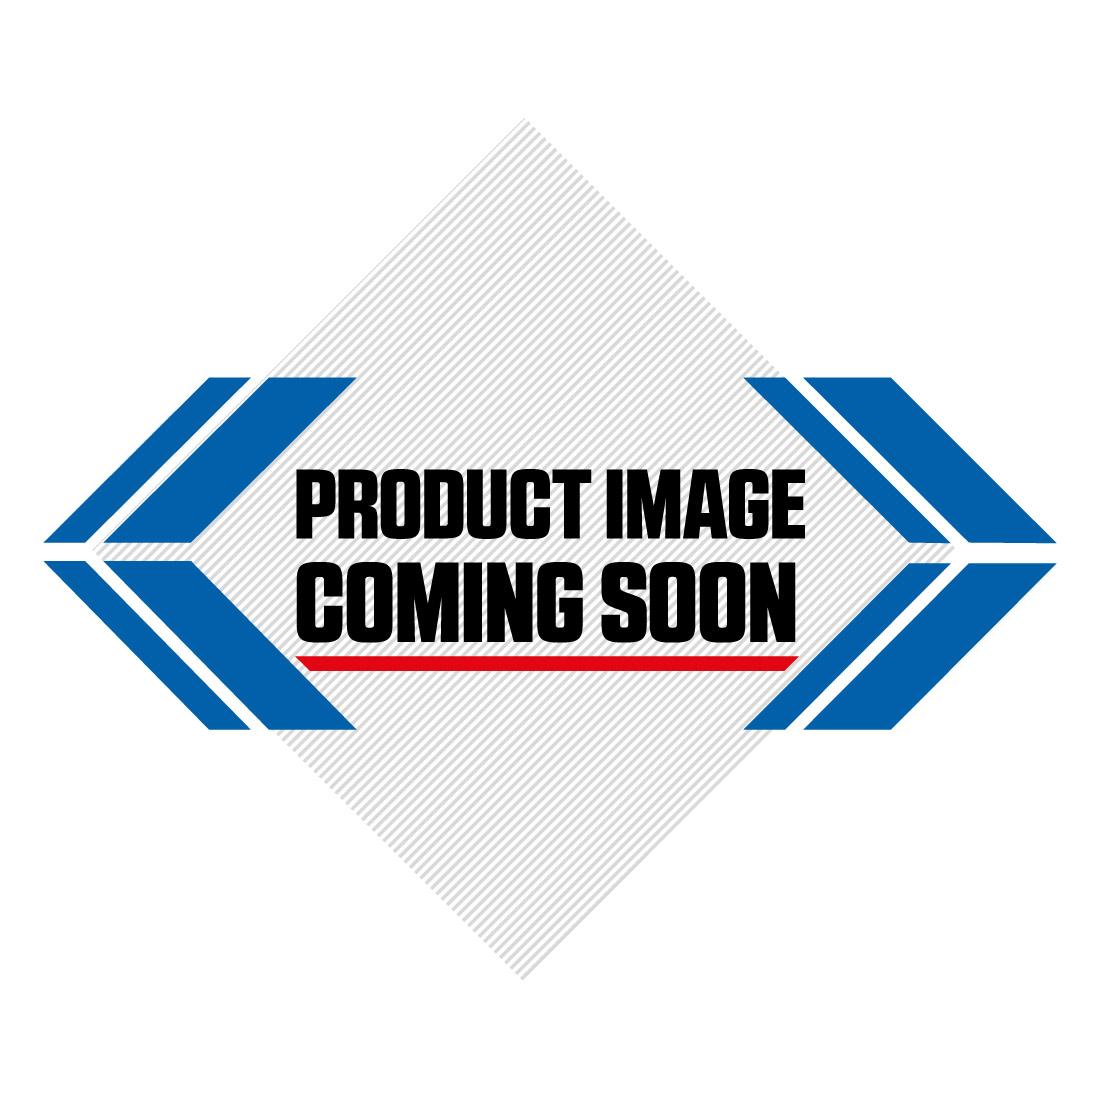 100% Armega Forecast Dual Pane Replacement Goggle Lens Image-2